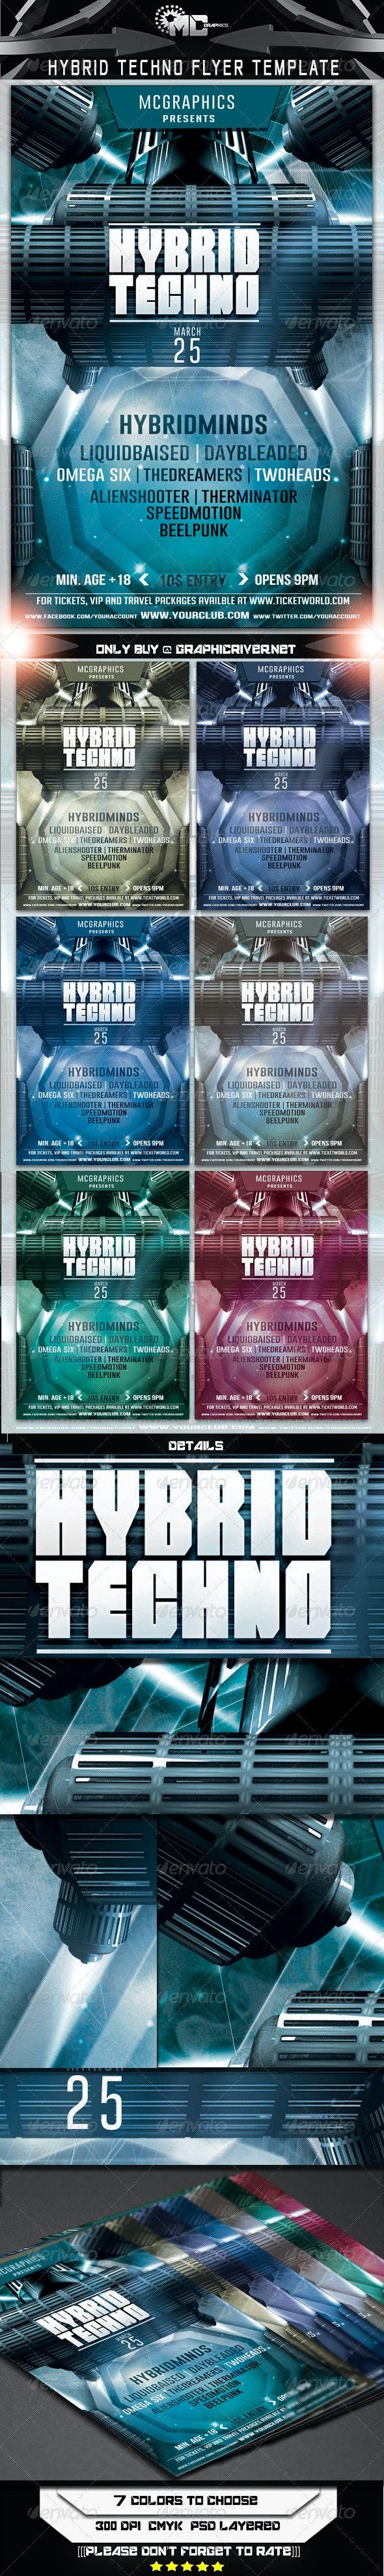 Hybrid Techno Flyer Template - Flyers Print Templates